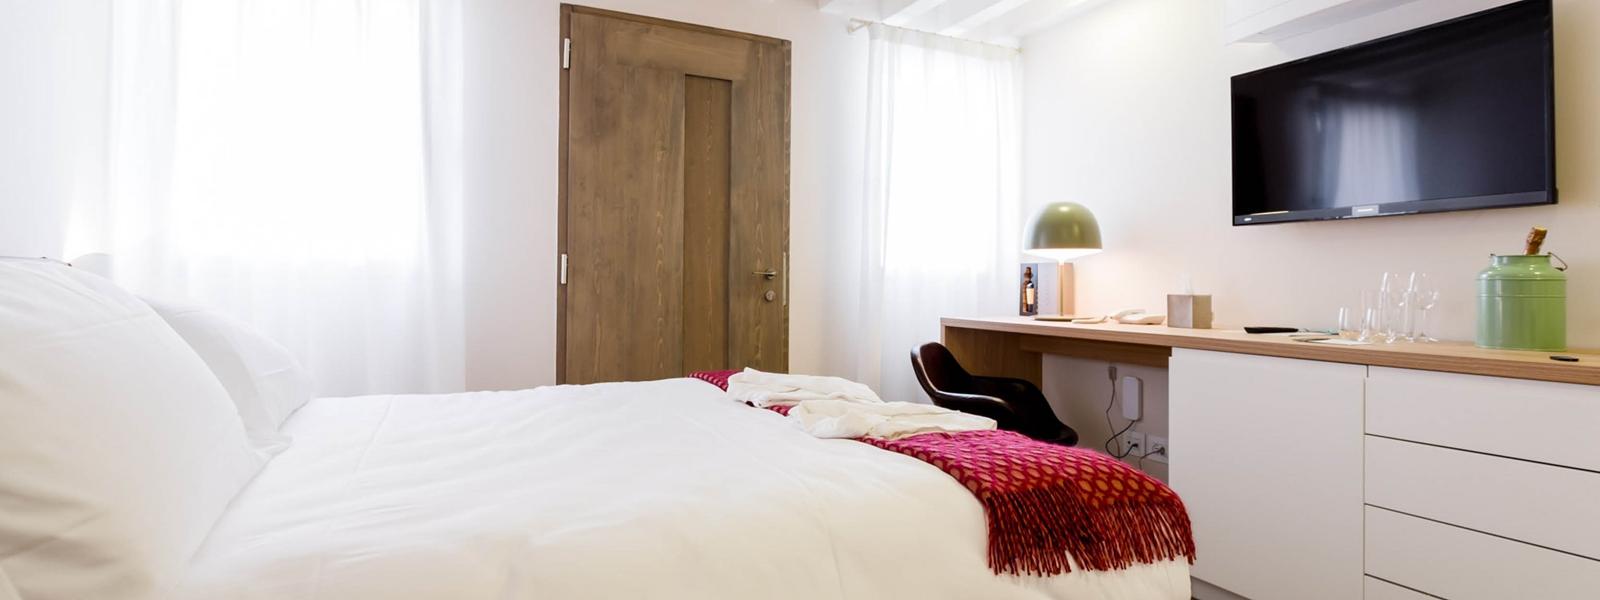 Hotel Burano camera superior